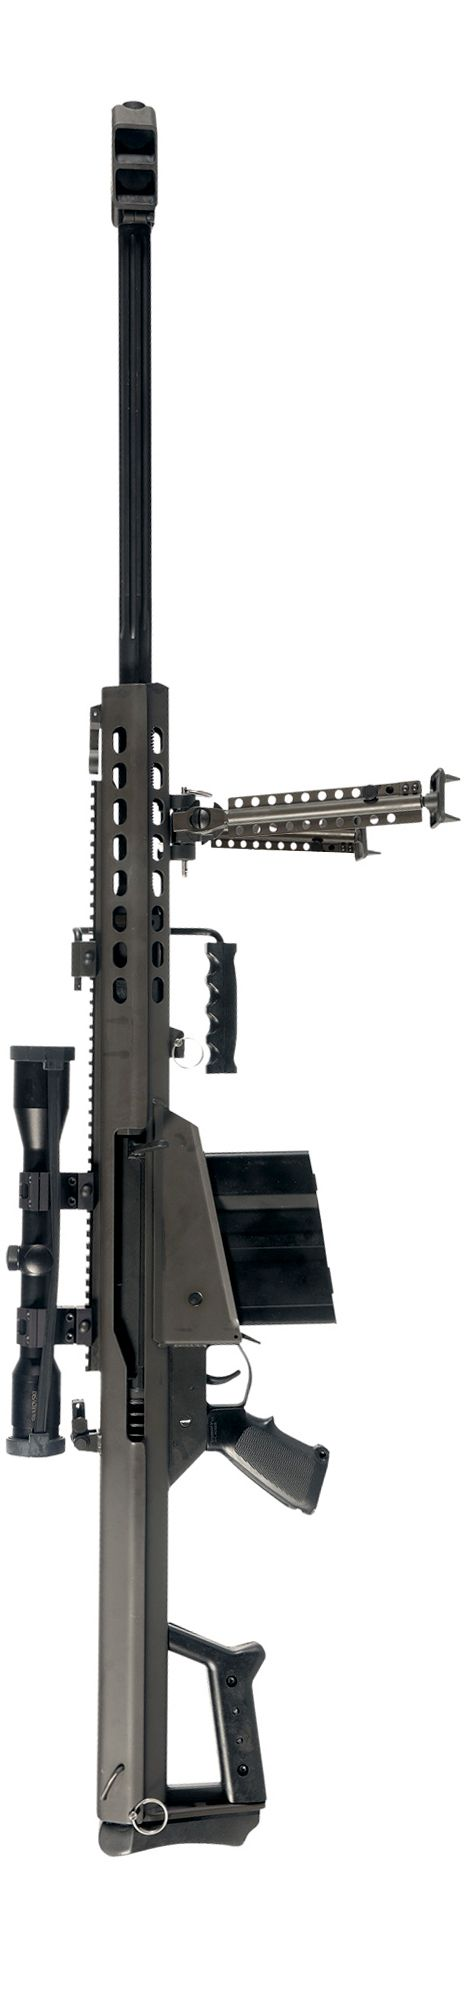 "Barrett M82 A1 ""Light Fifty"" 50 Caliber semi-automatic anti-material rifle with 10 round detachable box magazine. Range 1800 meters."